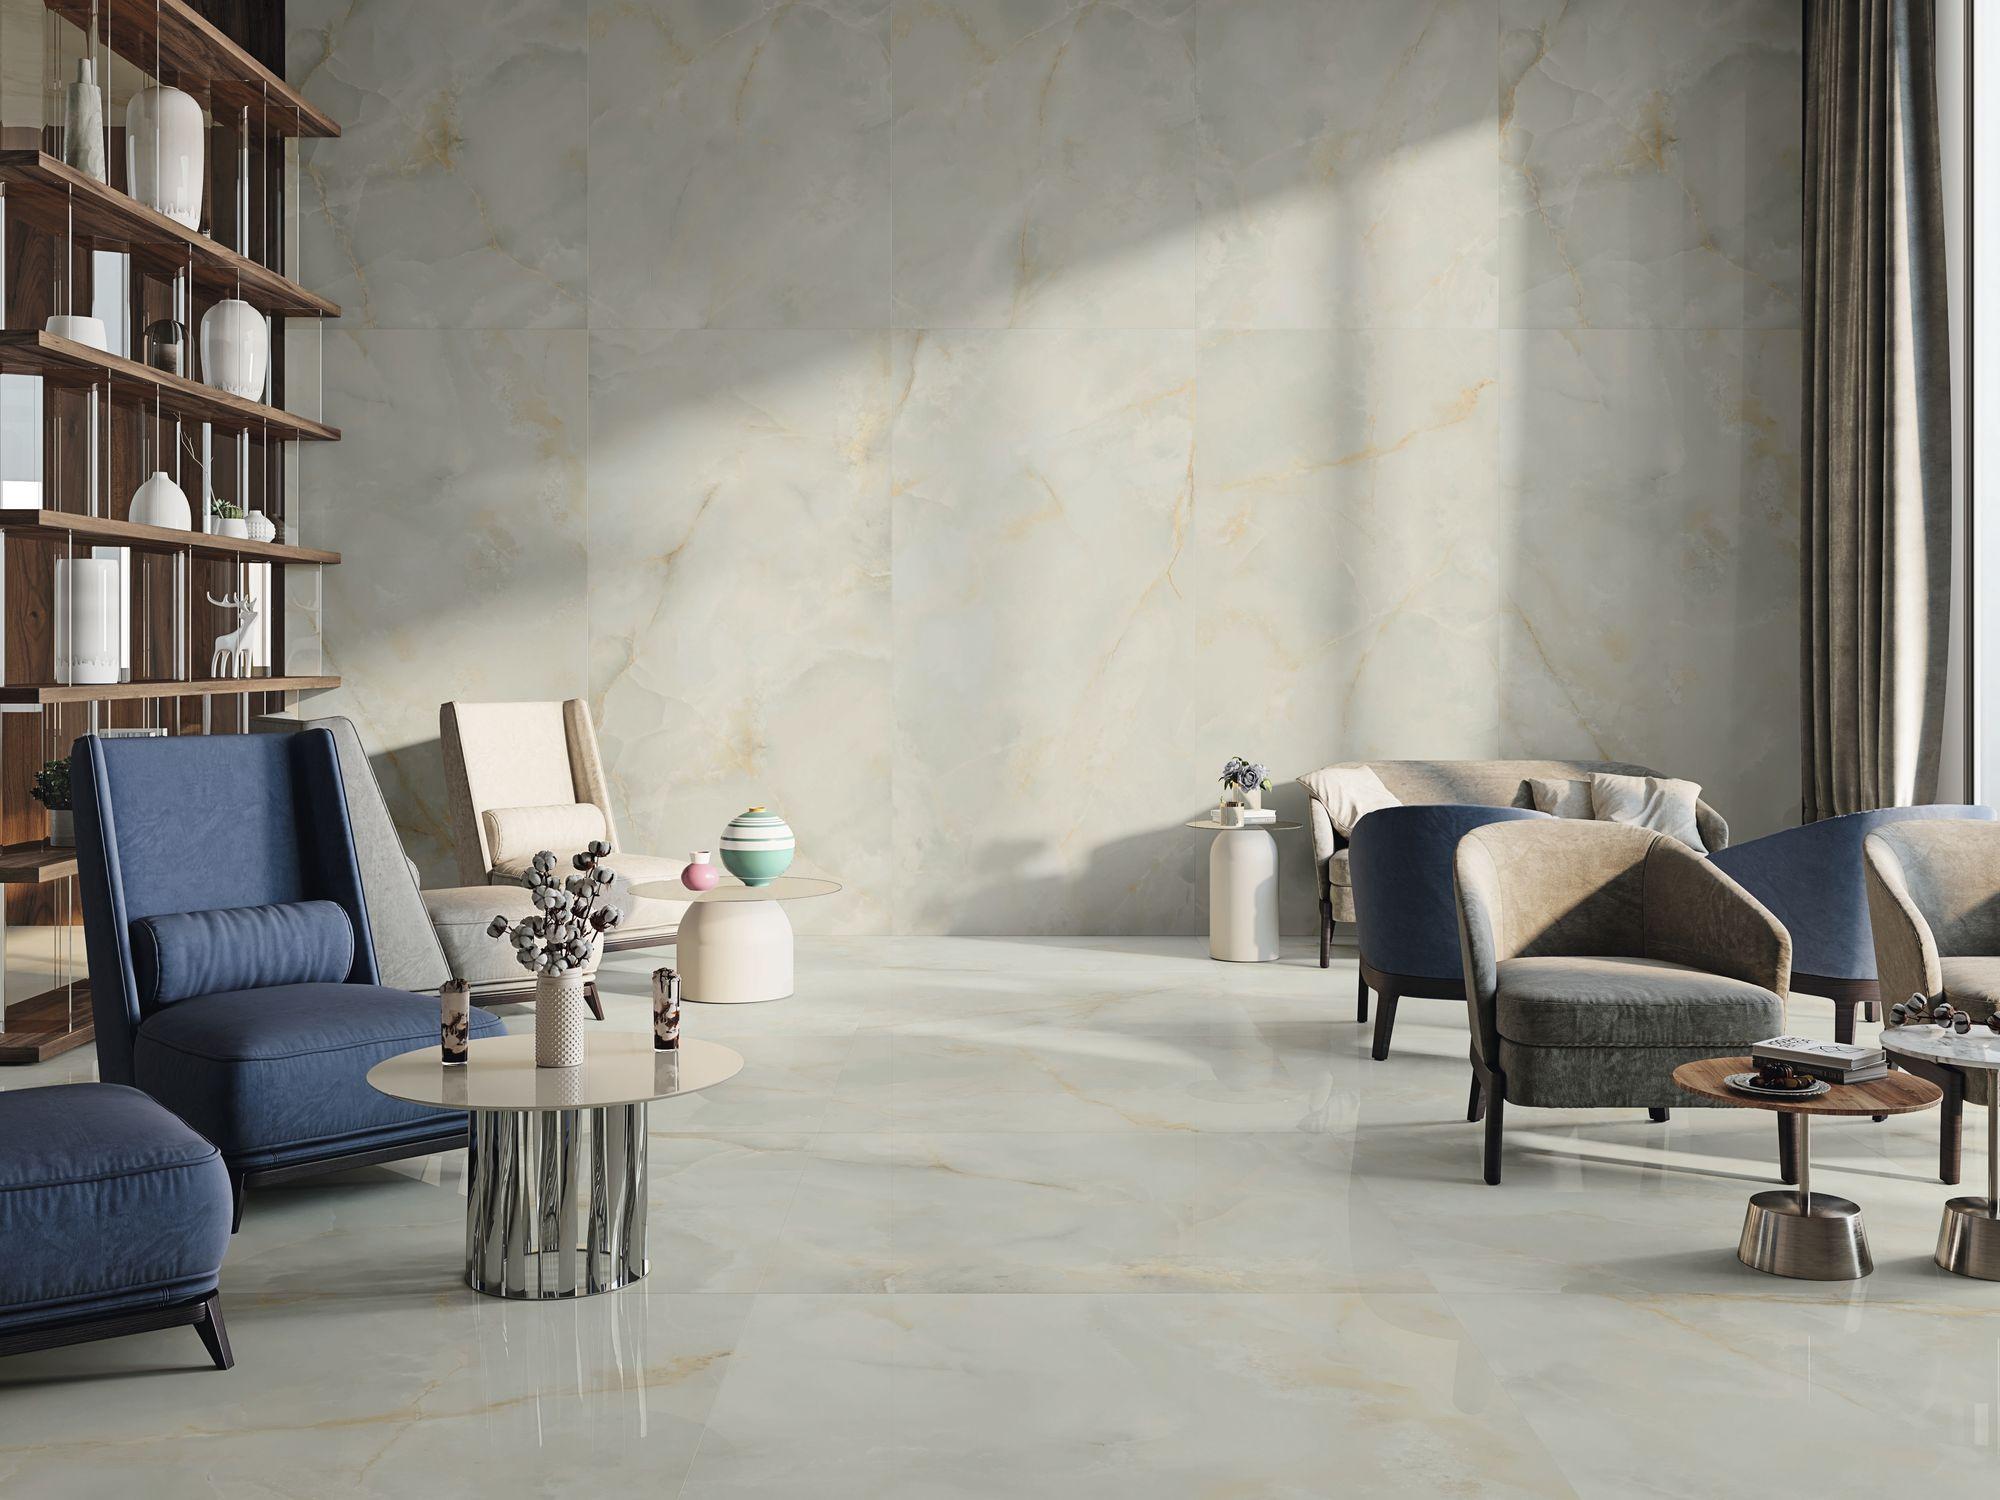 Quios Silver pulido 120x240 cm. Pavimento Silver pulido 120x120 cm.